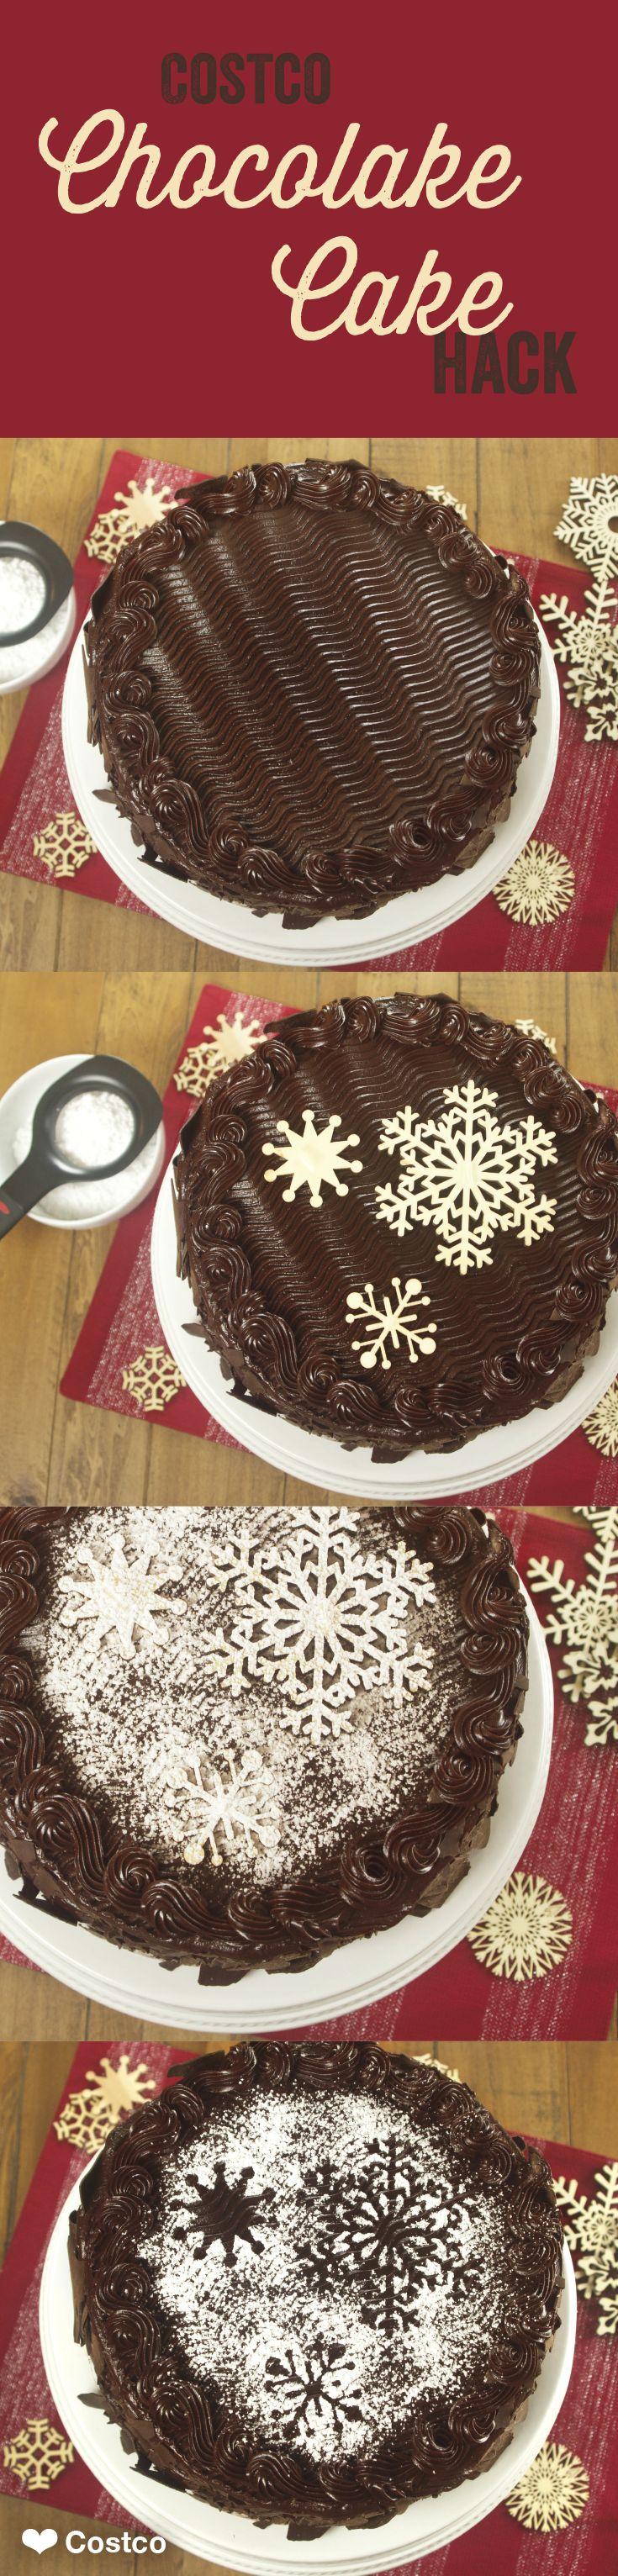 111 best Delicious Desserts images on Pinterest | Delicious ...